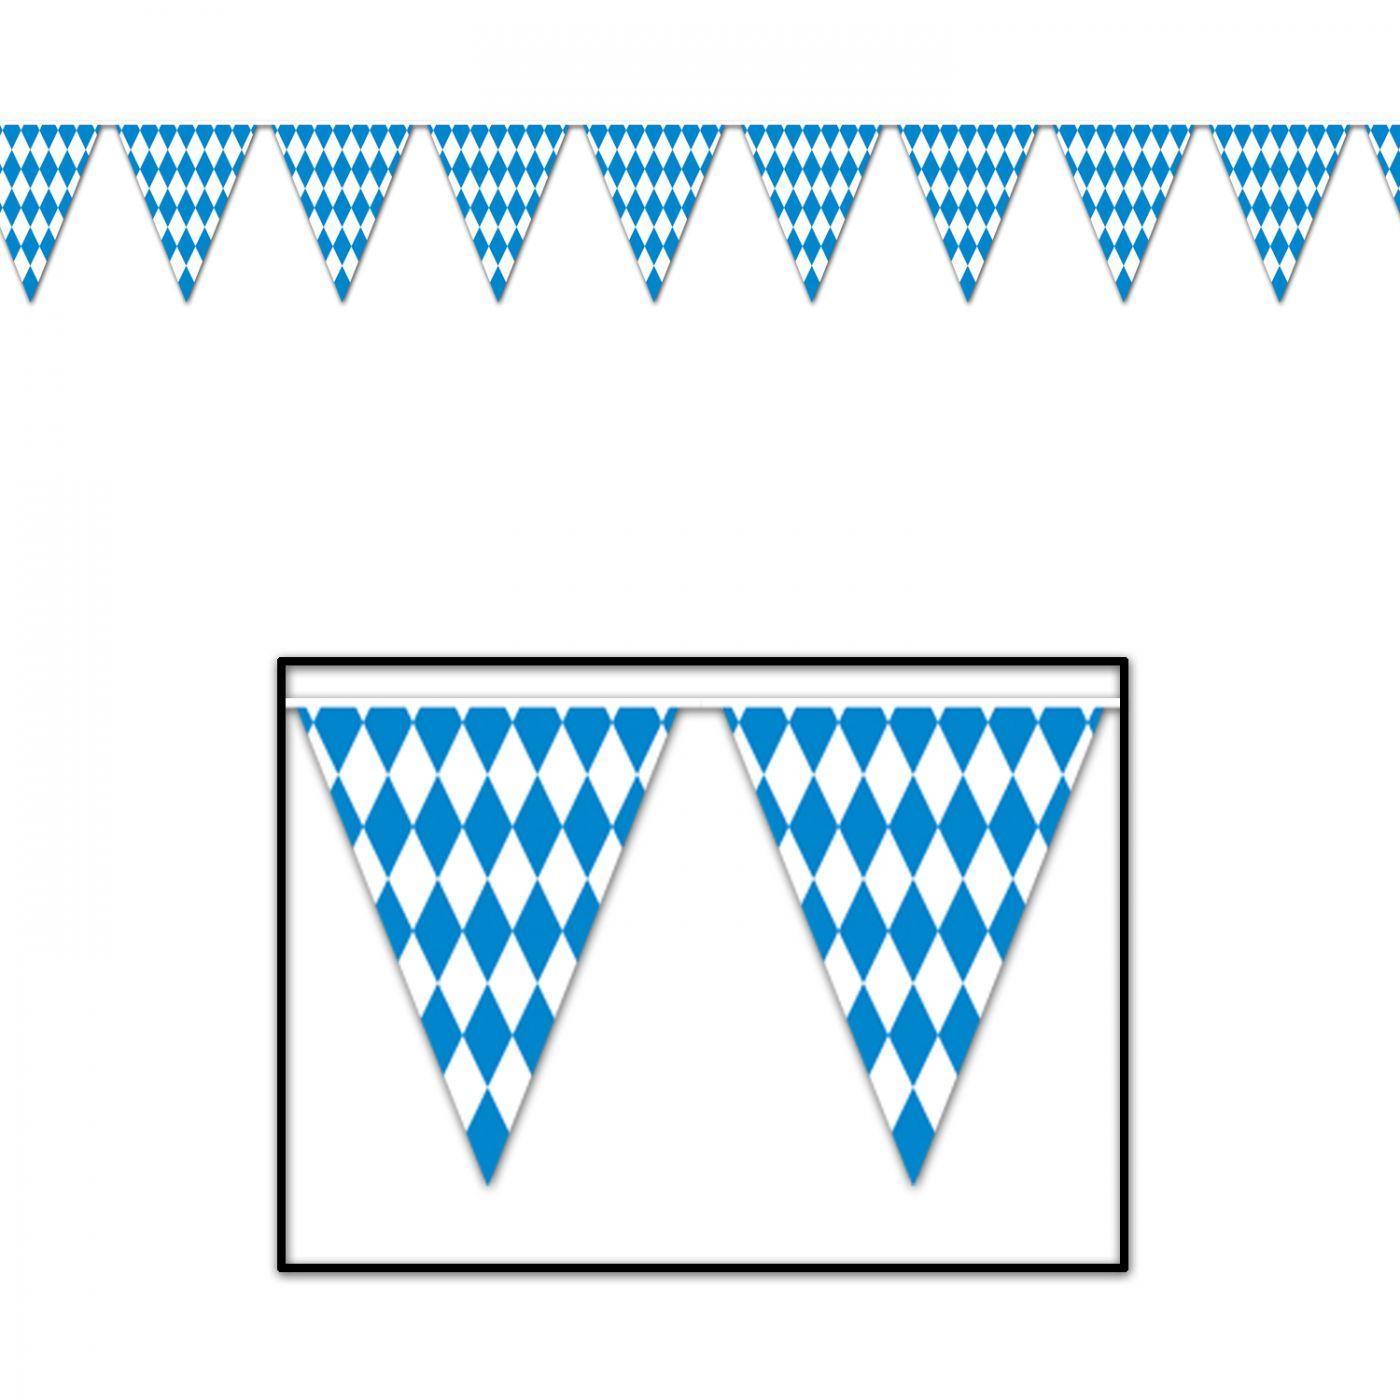 Oktoberfest Pennant Banner image